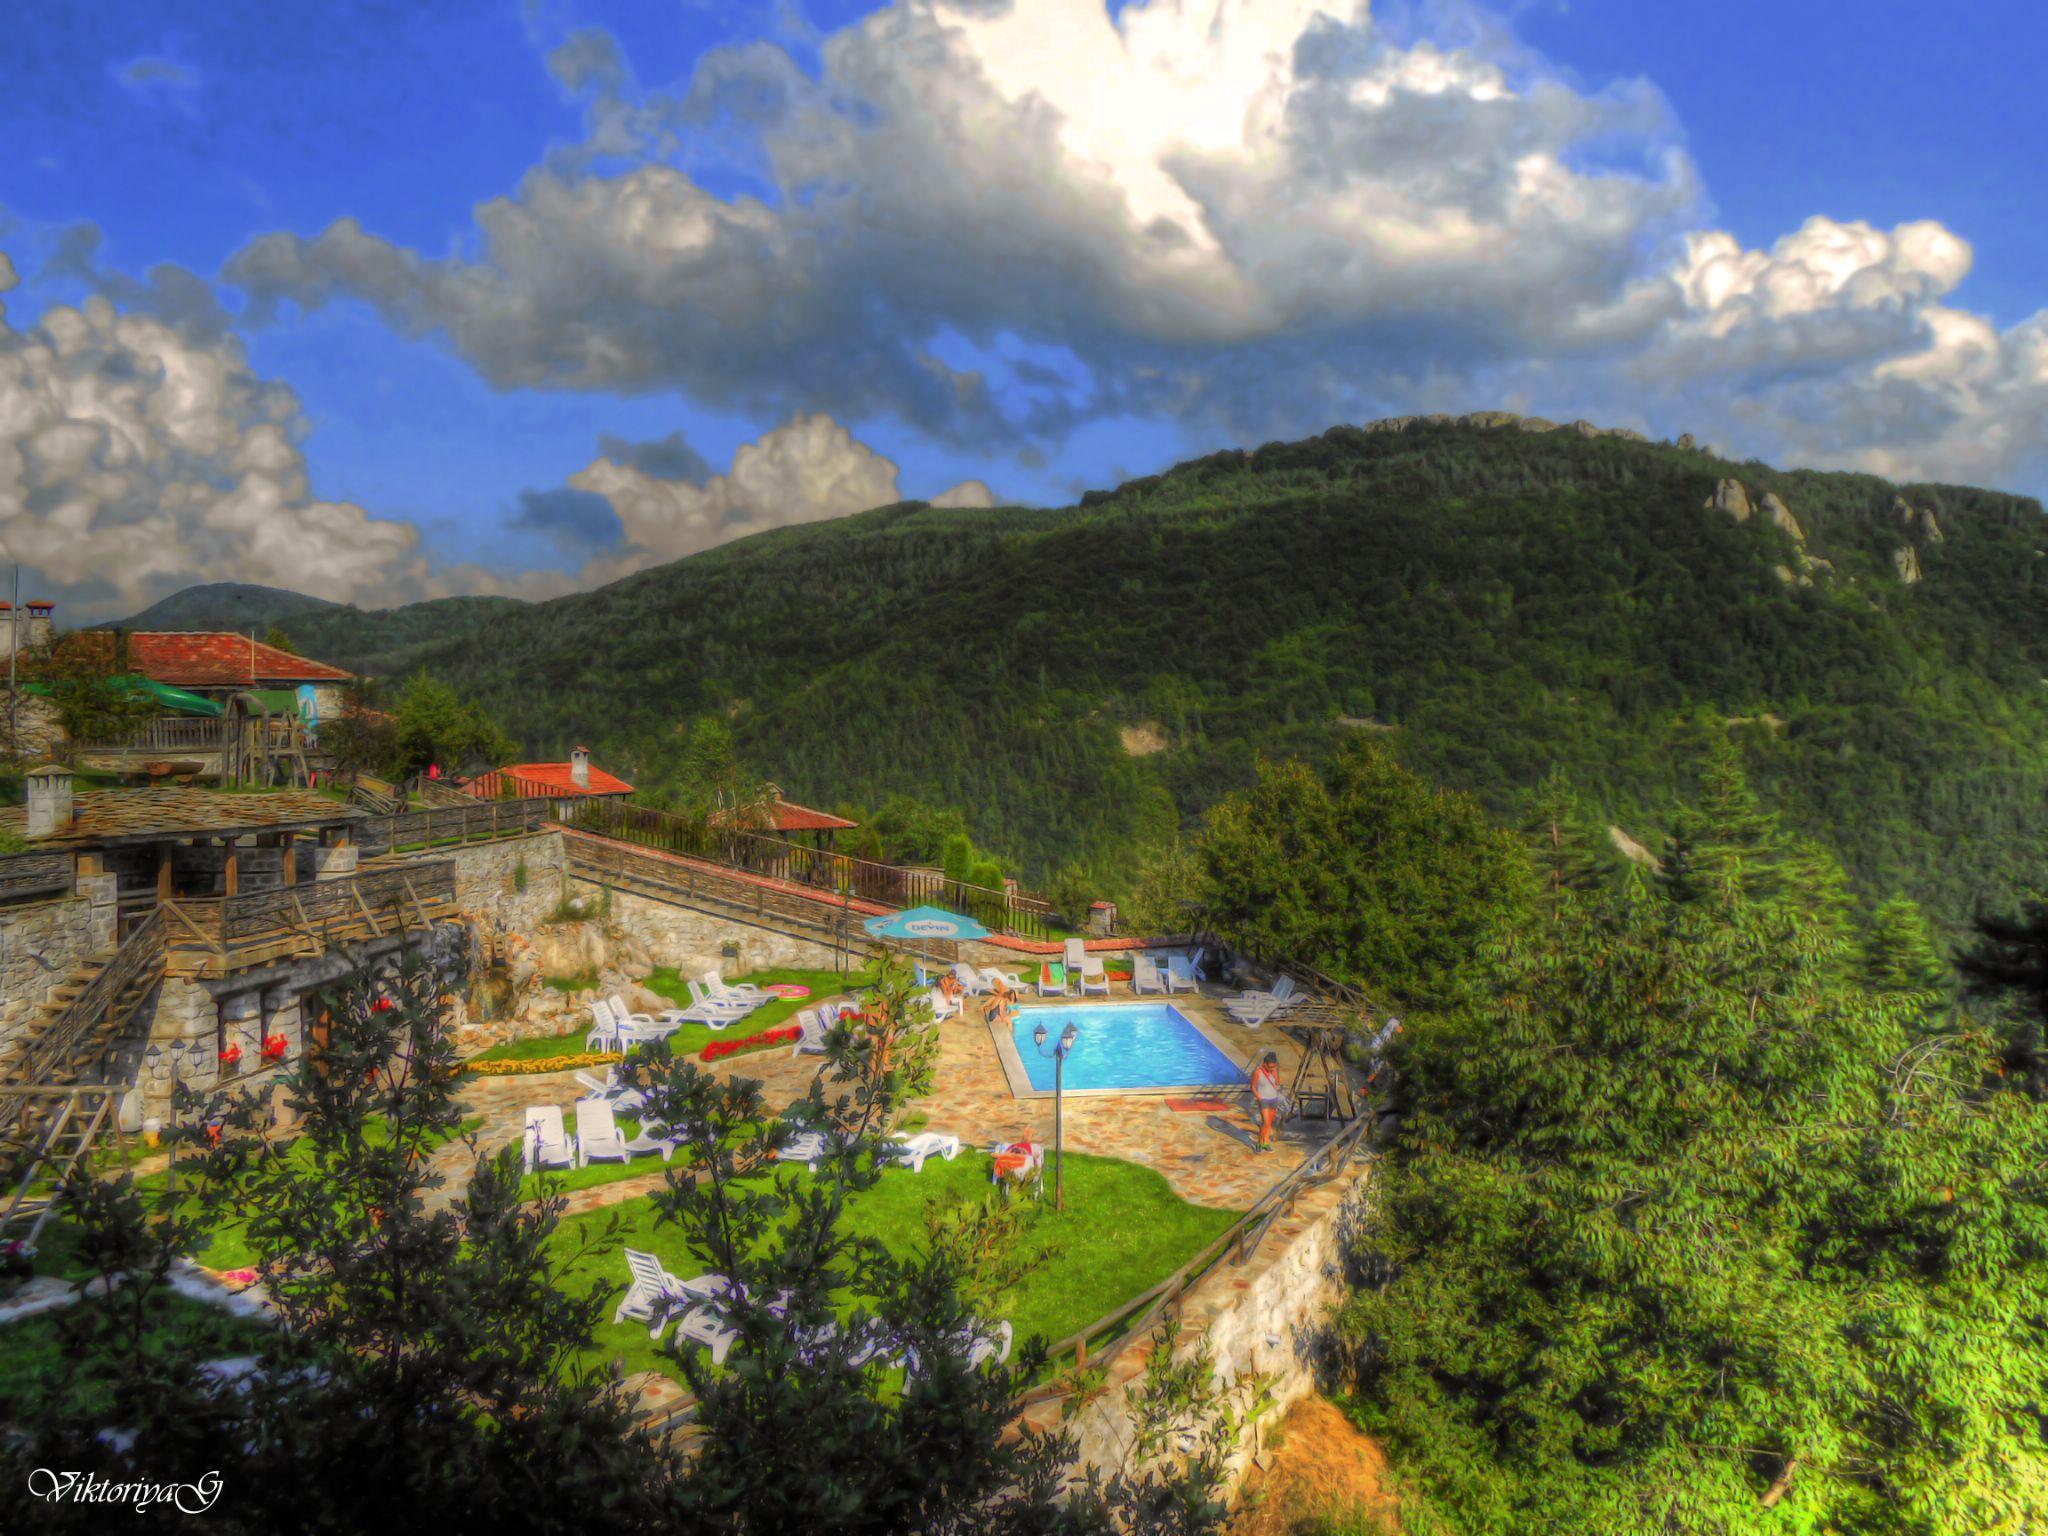 Rhodope Mountains by Viktoriya Georgieva